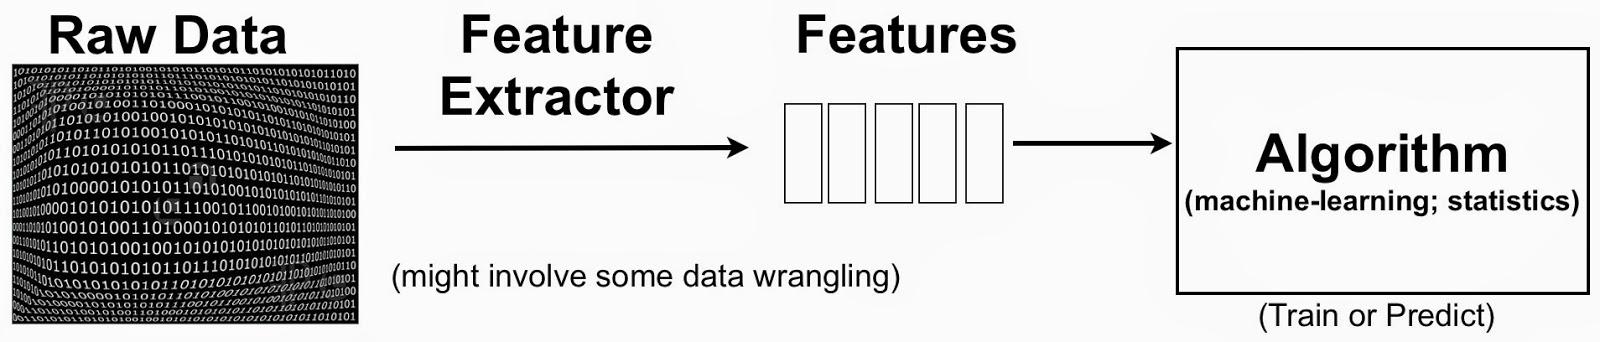 features-in-ML.jpg